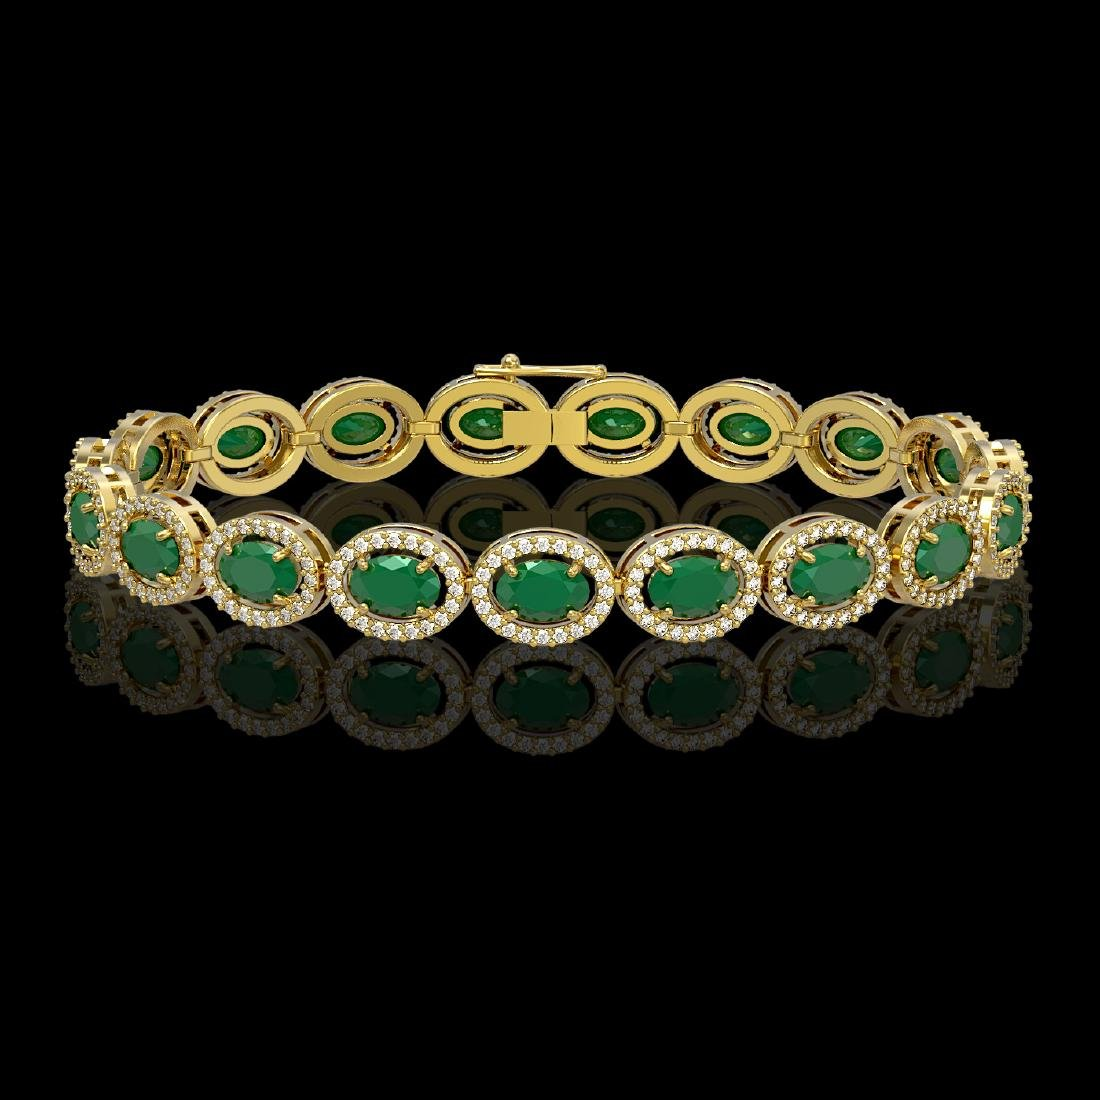 15.2 CTW Emerald & Diamond Halo Bracelet 10K Yellow